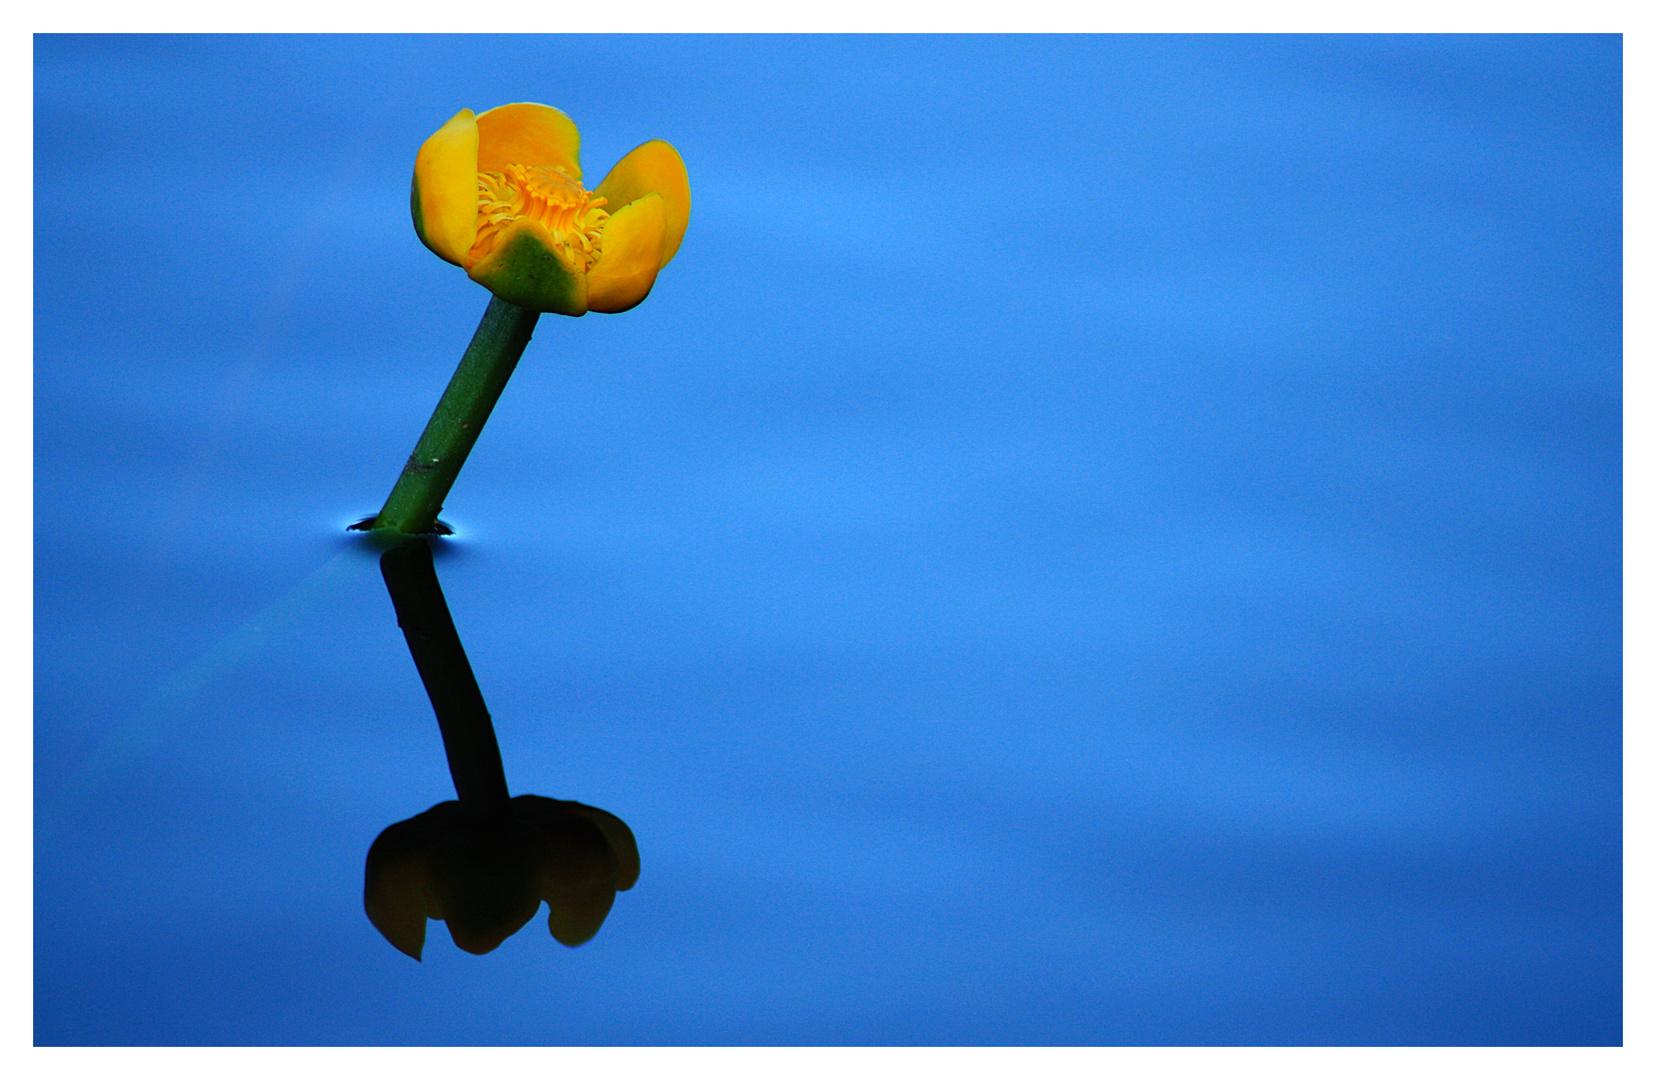 Love reflecting everything